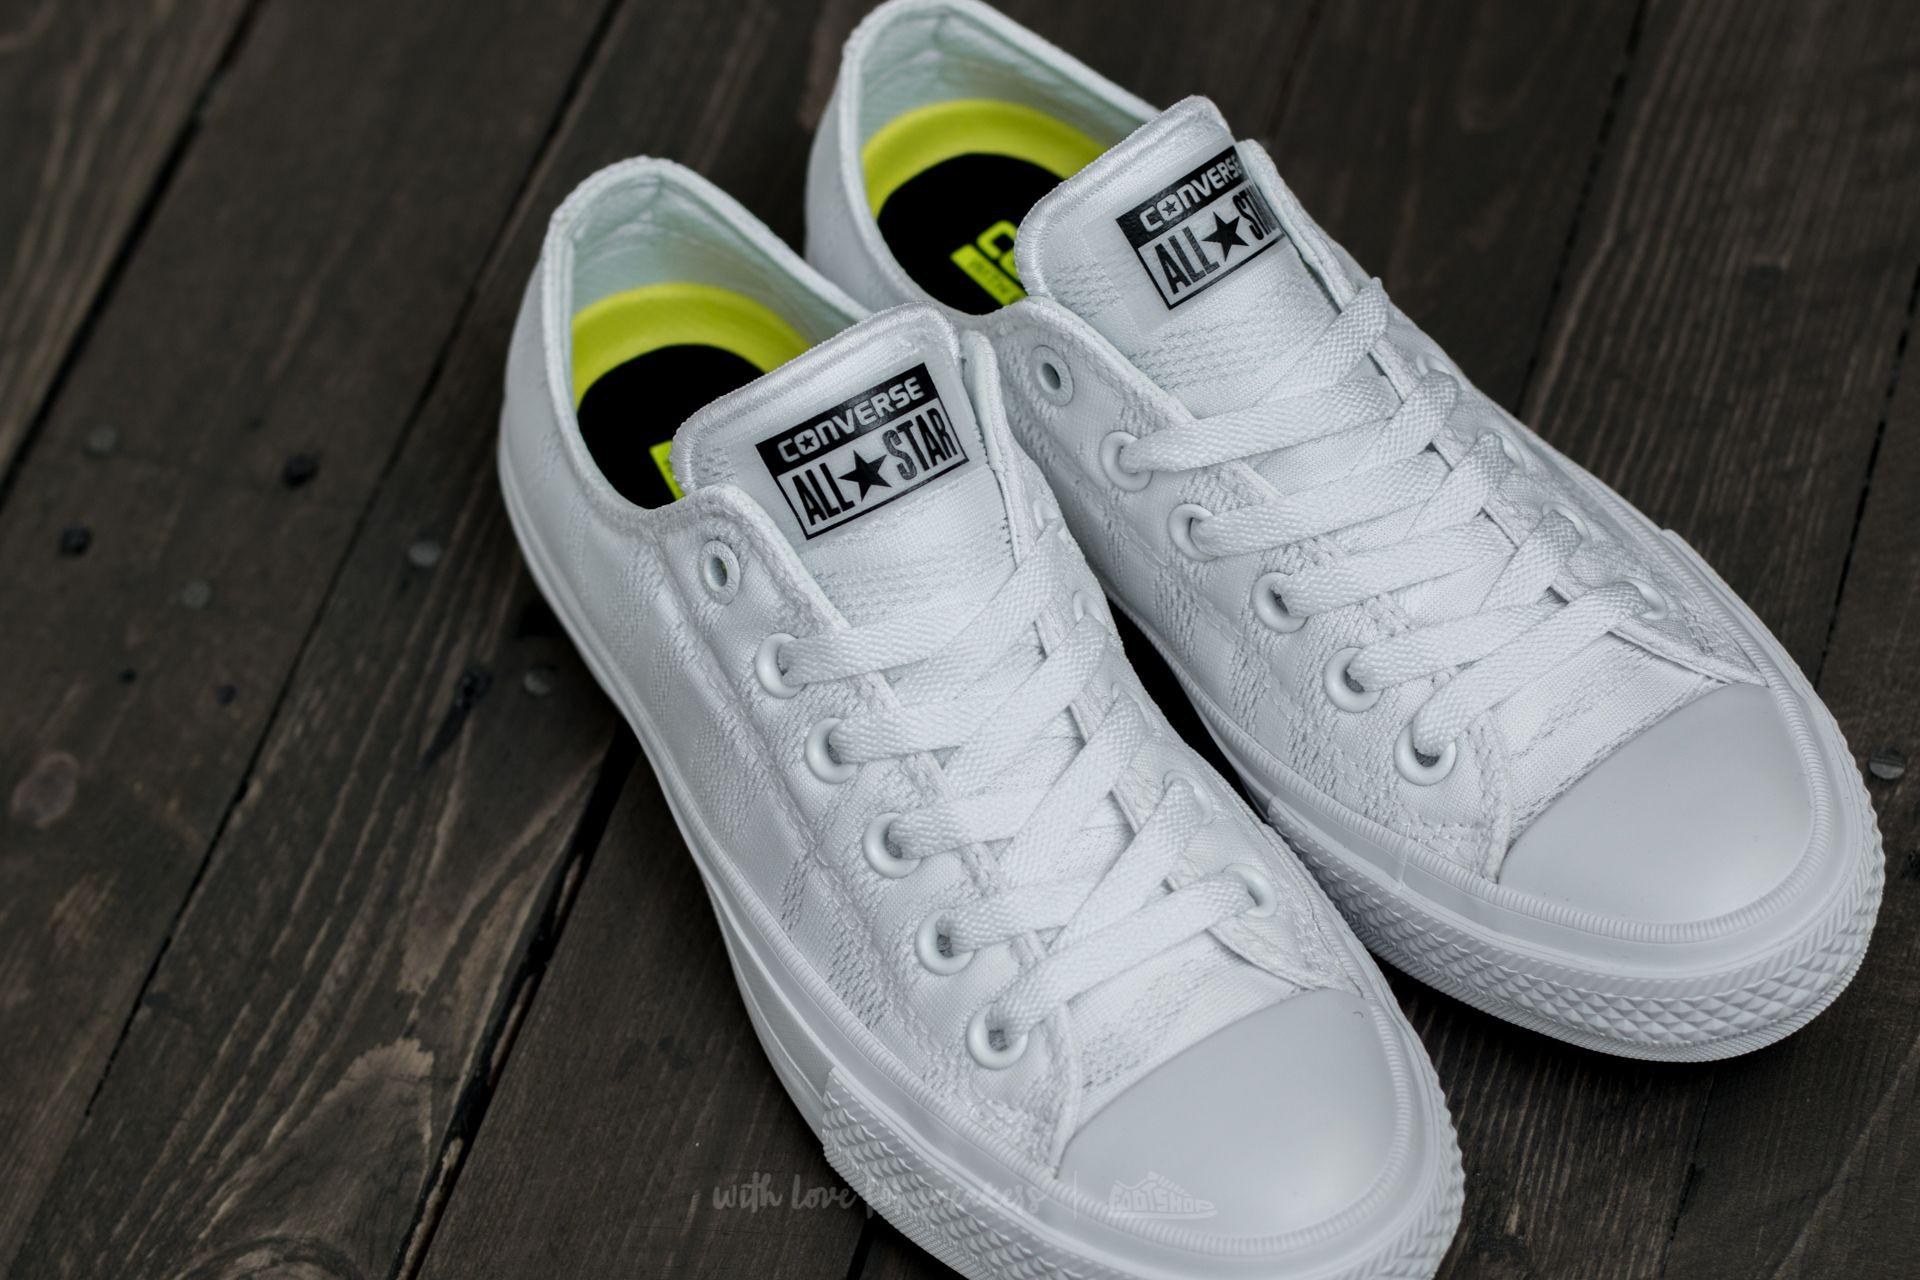 rima Incorrecto Célula somatica  Women's shoes Converse Chuck Taylor All Star II Ox White/ White/ Gum